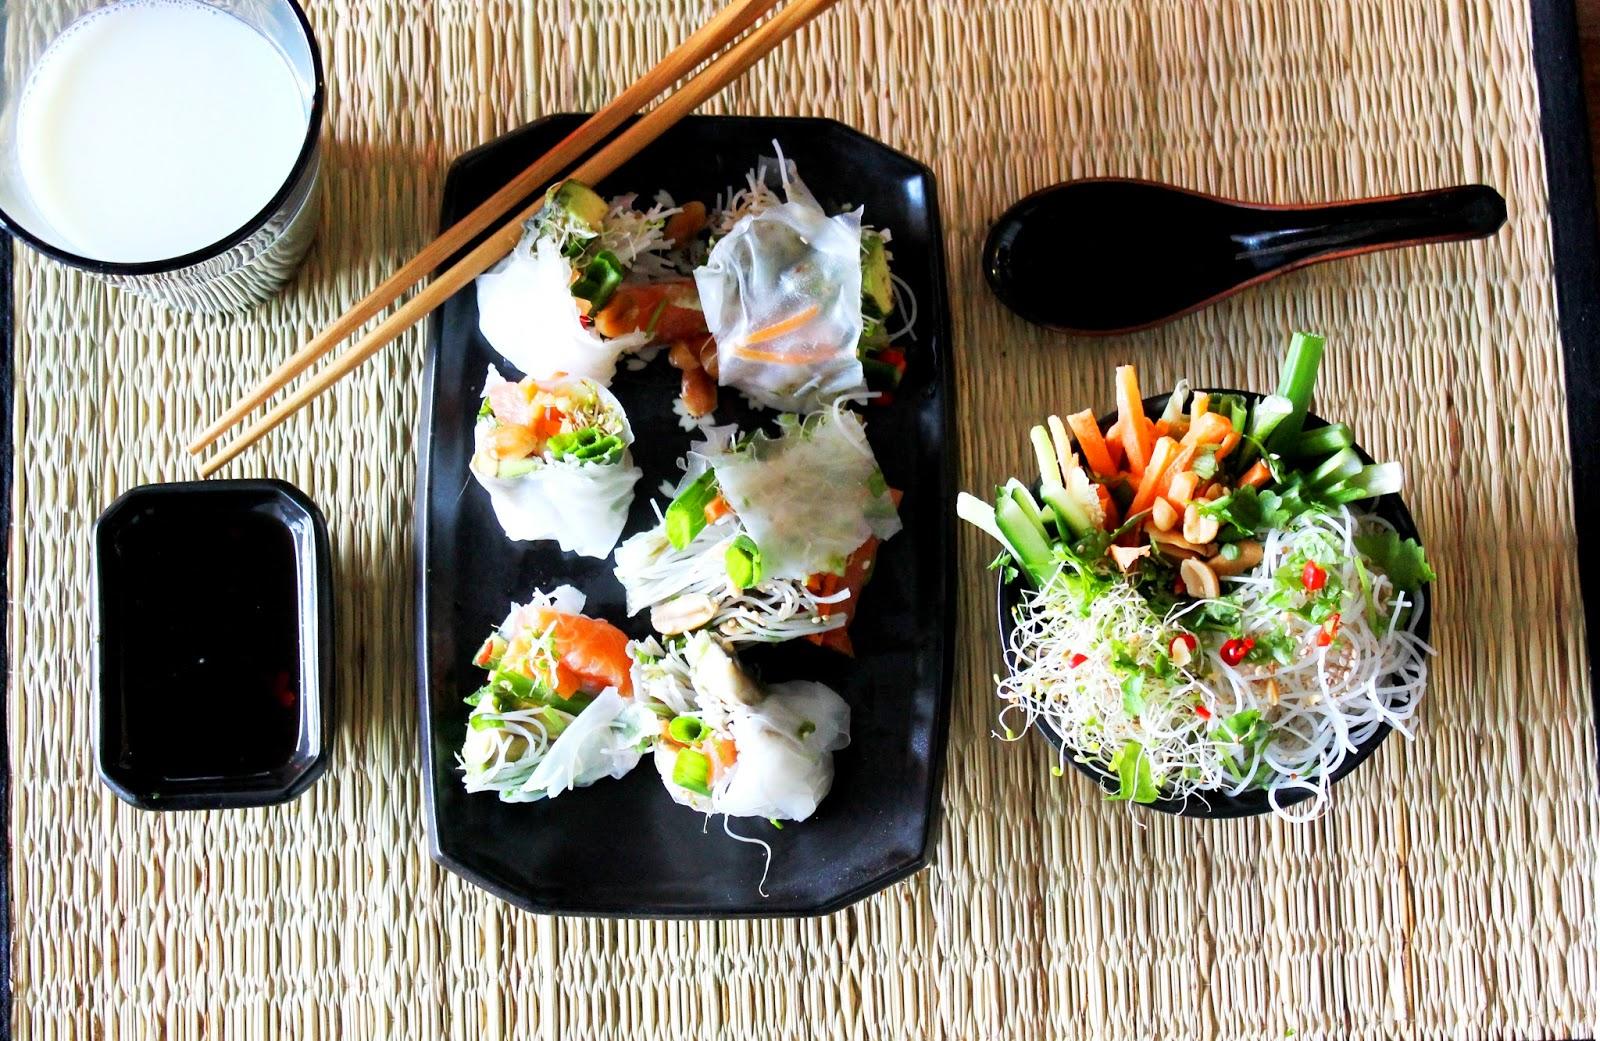 Ricepaper rolls and vermicelli noodle cup   Alinan kotona blog #eating #asianfood #springrolls